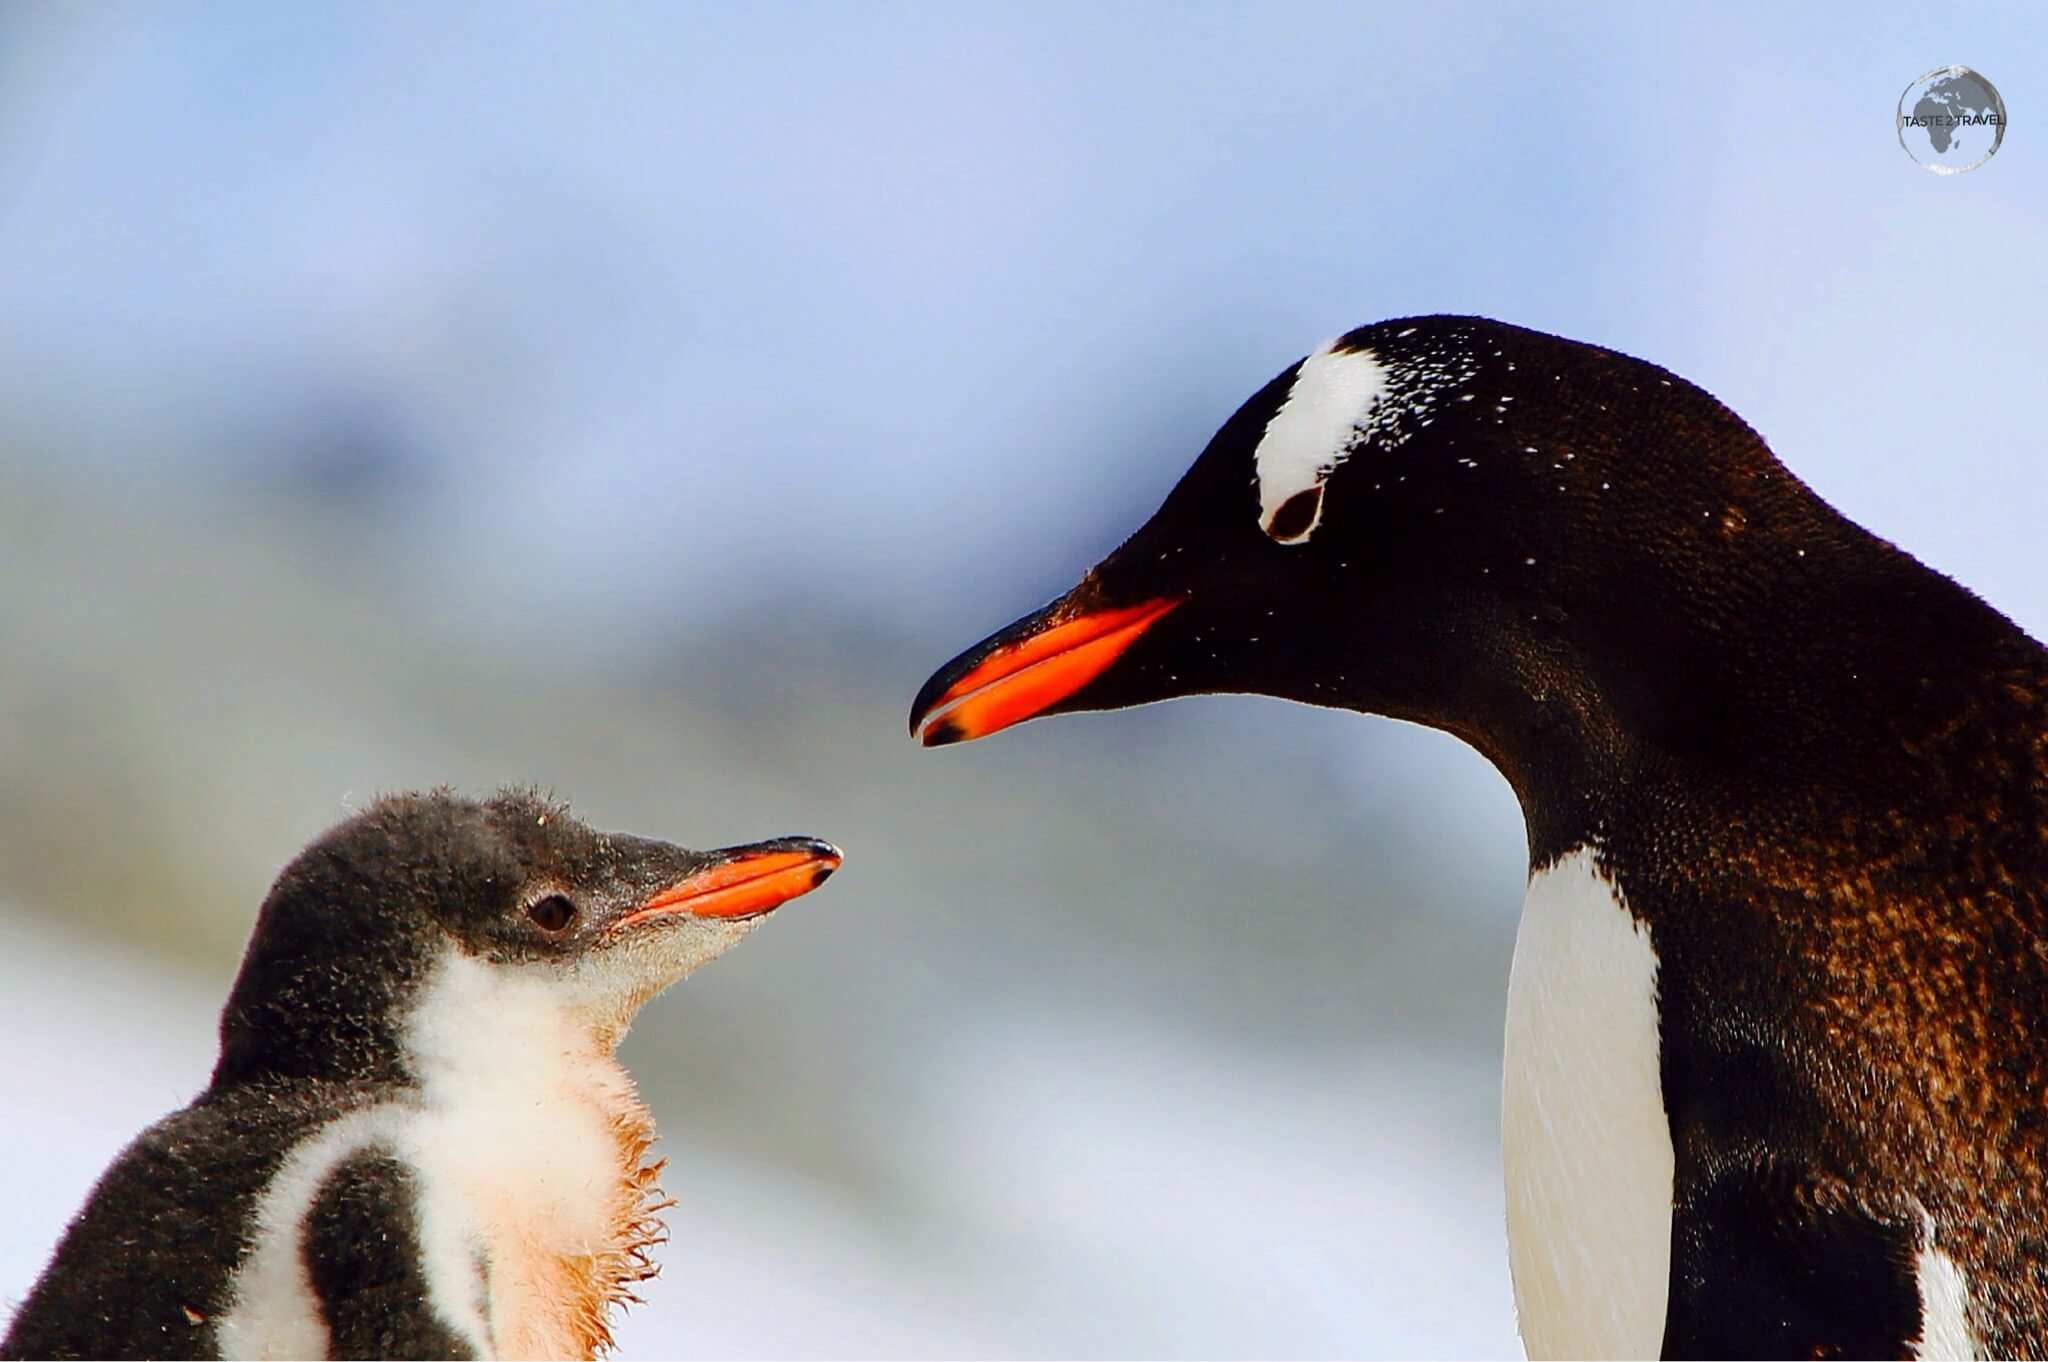 Antarctica Travel Guide: Adelie Penguin